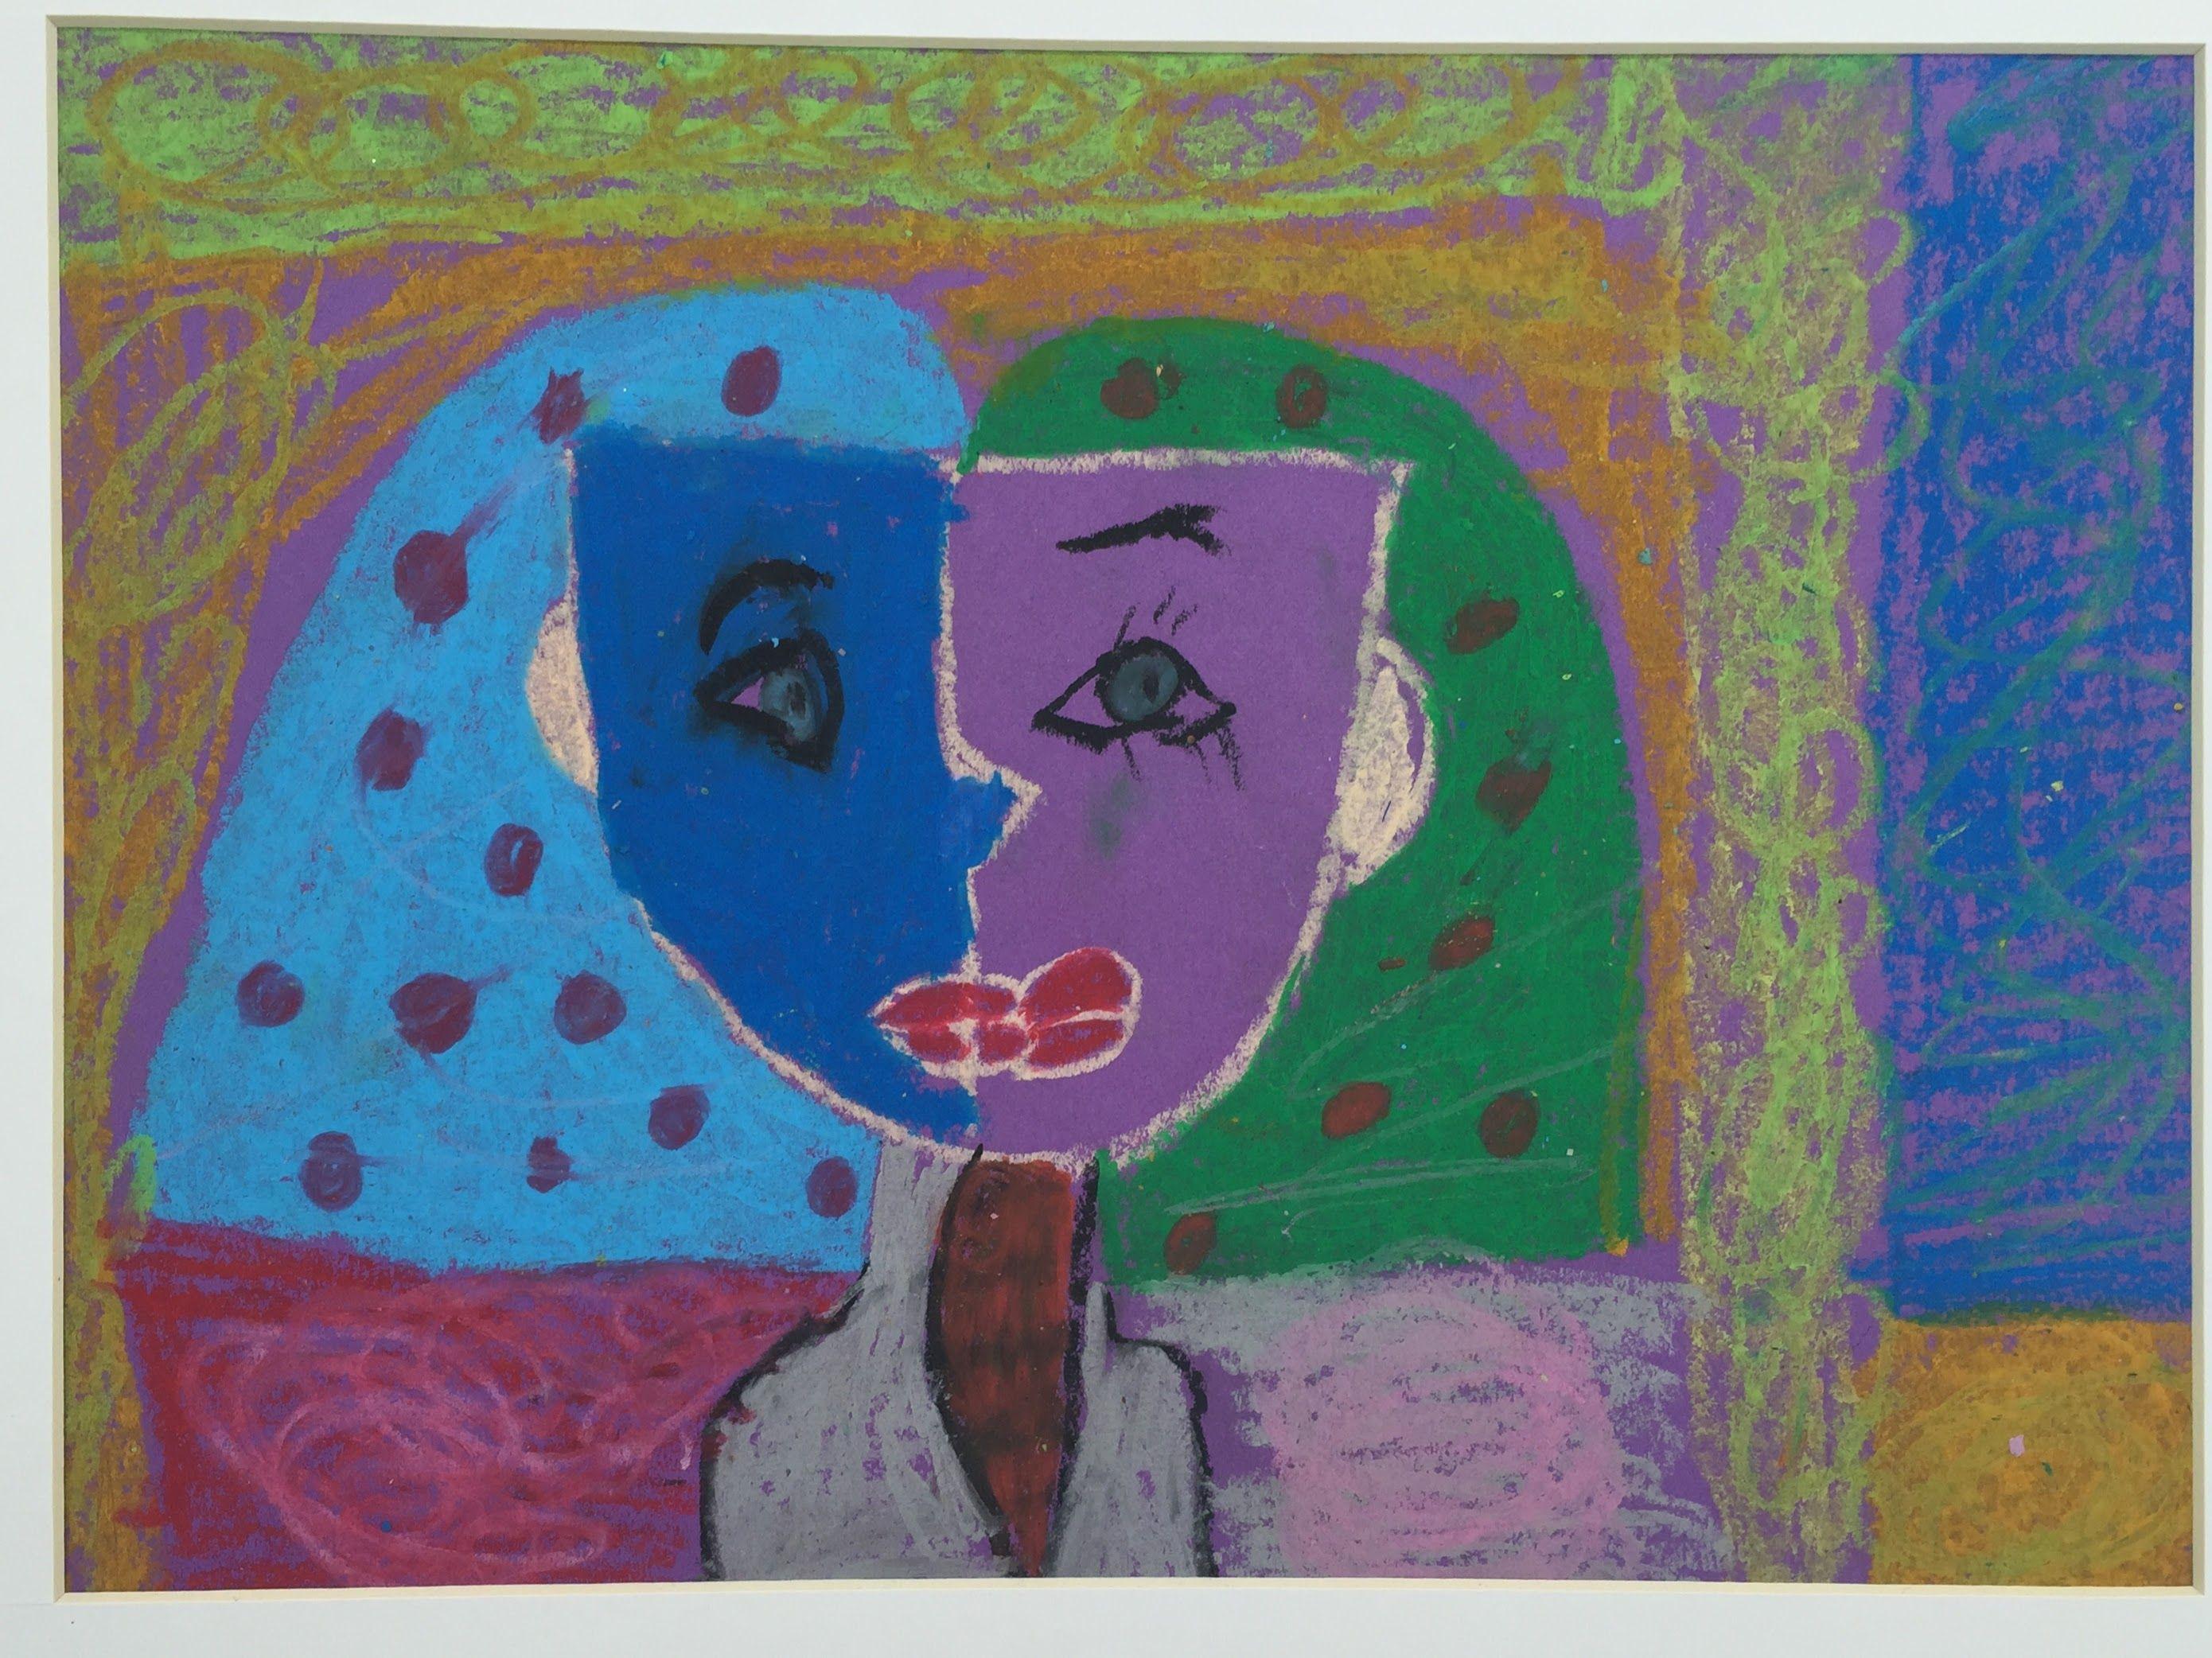 Pin By Midge Caparosa On Midge S Art Room